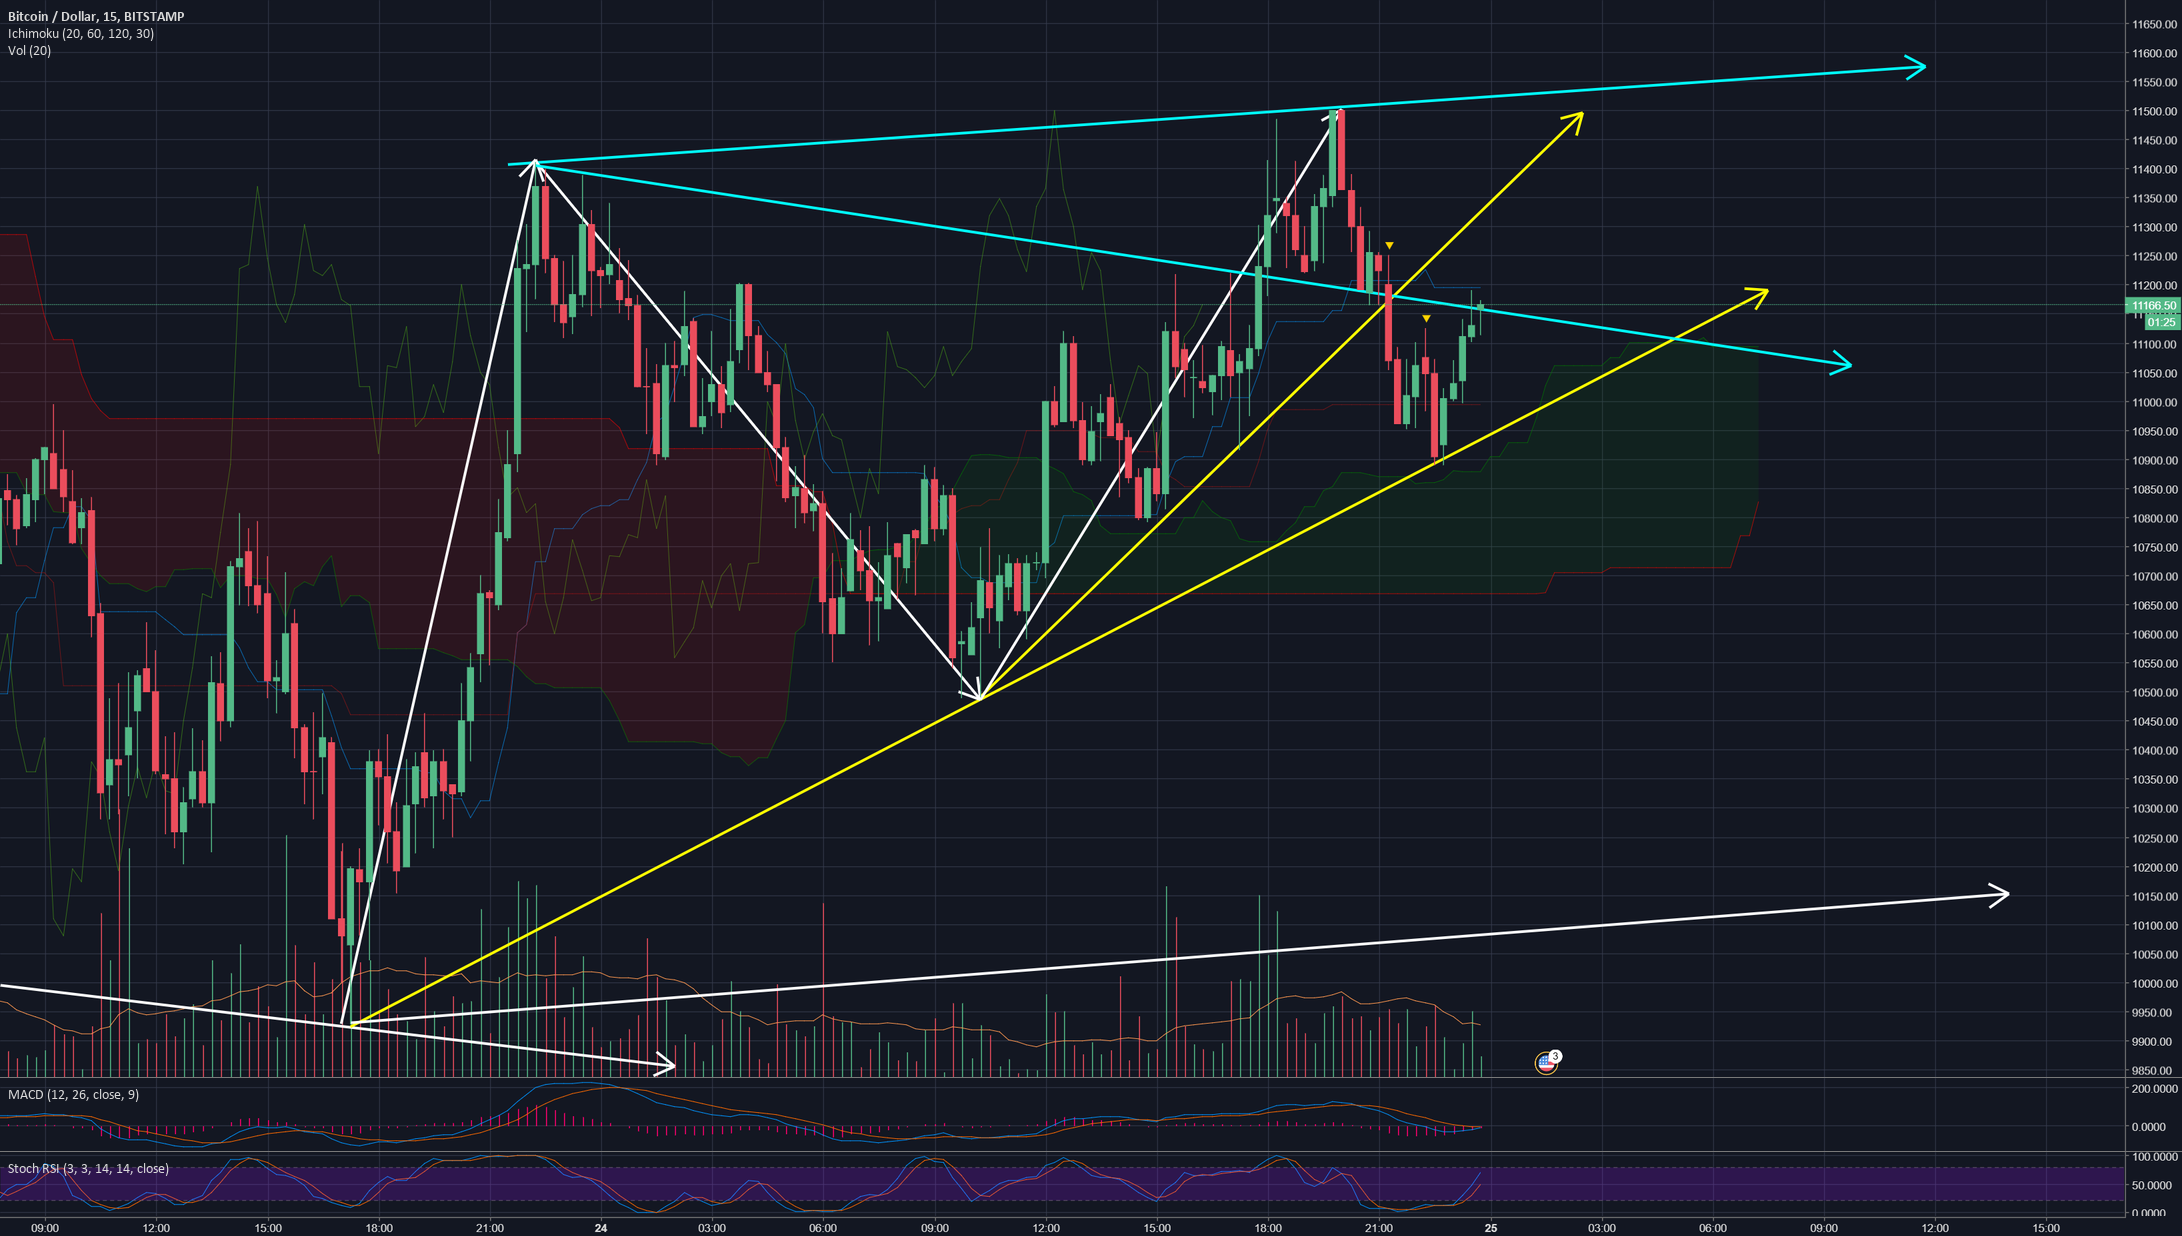 Bitcoin 15 Min chart - Update 1